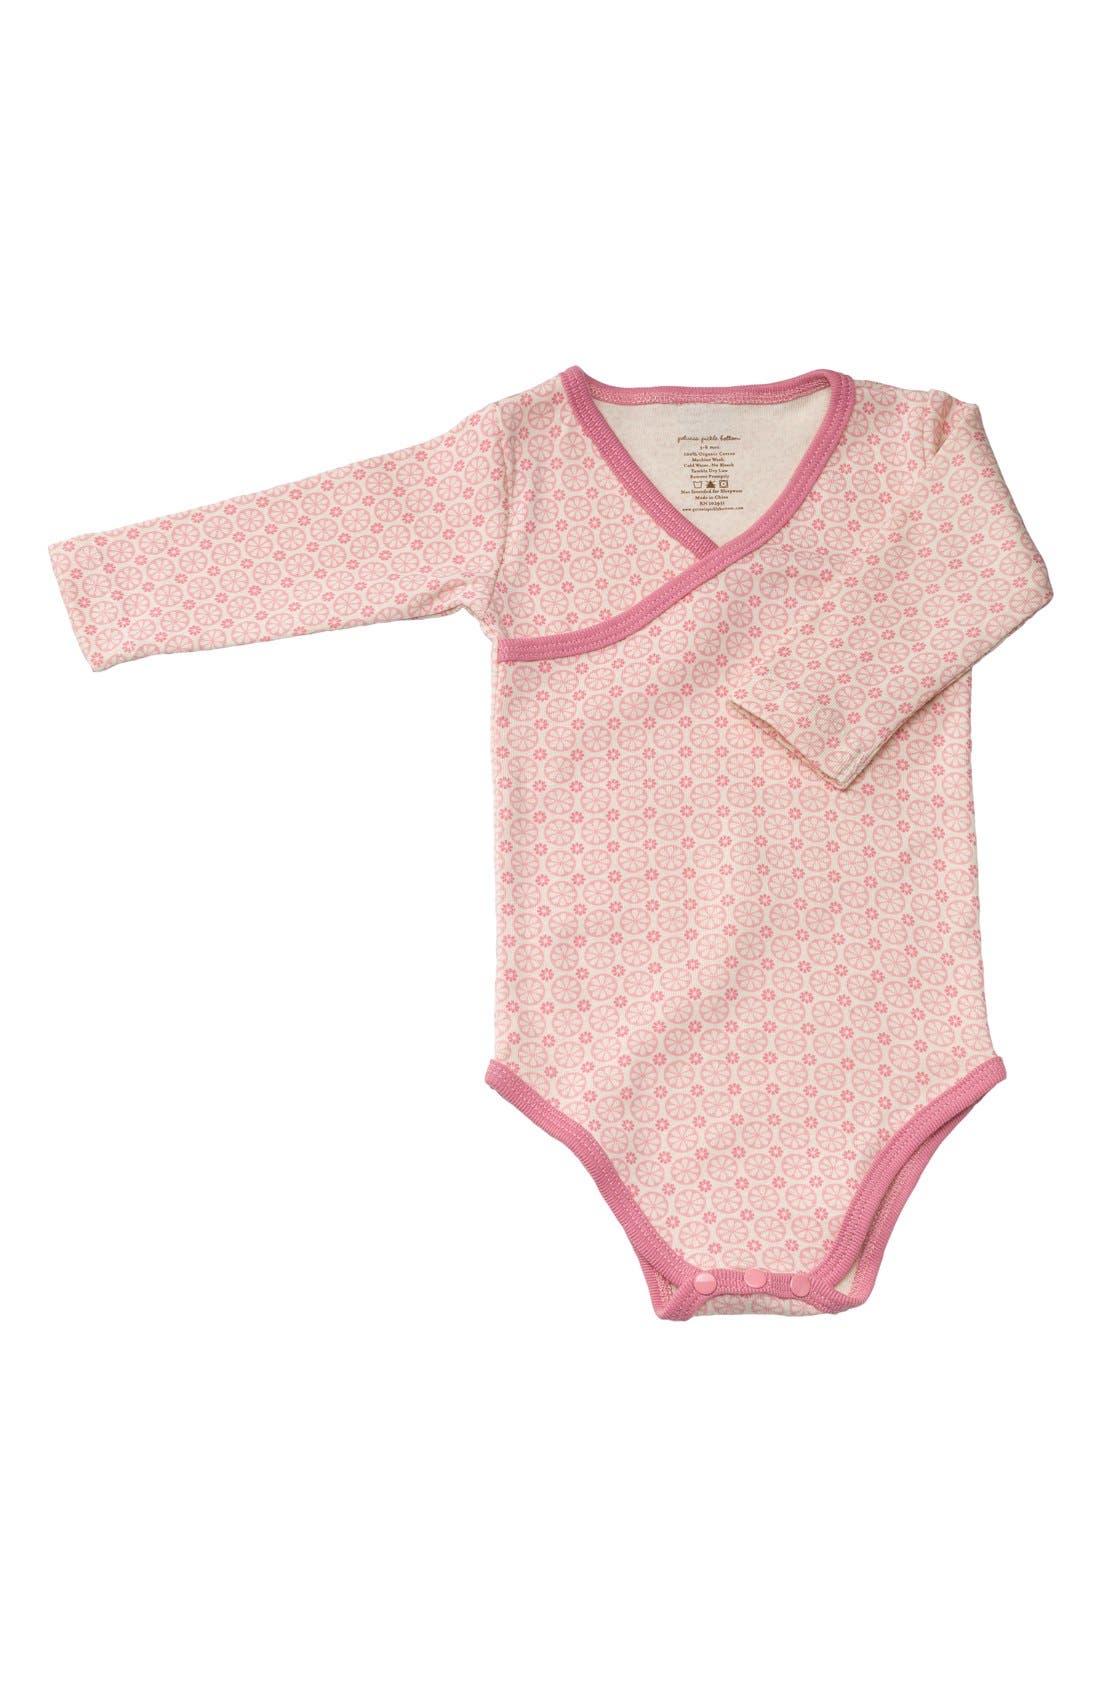 Main Image - Petunia Pickle Bottom Organic Cotton Long Sleeve Bodysuit (Baby Girls)